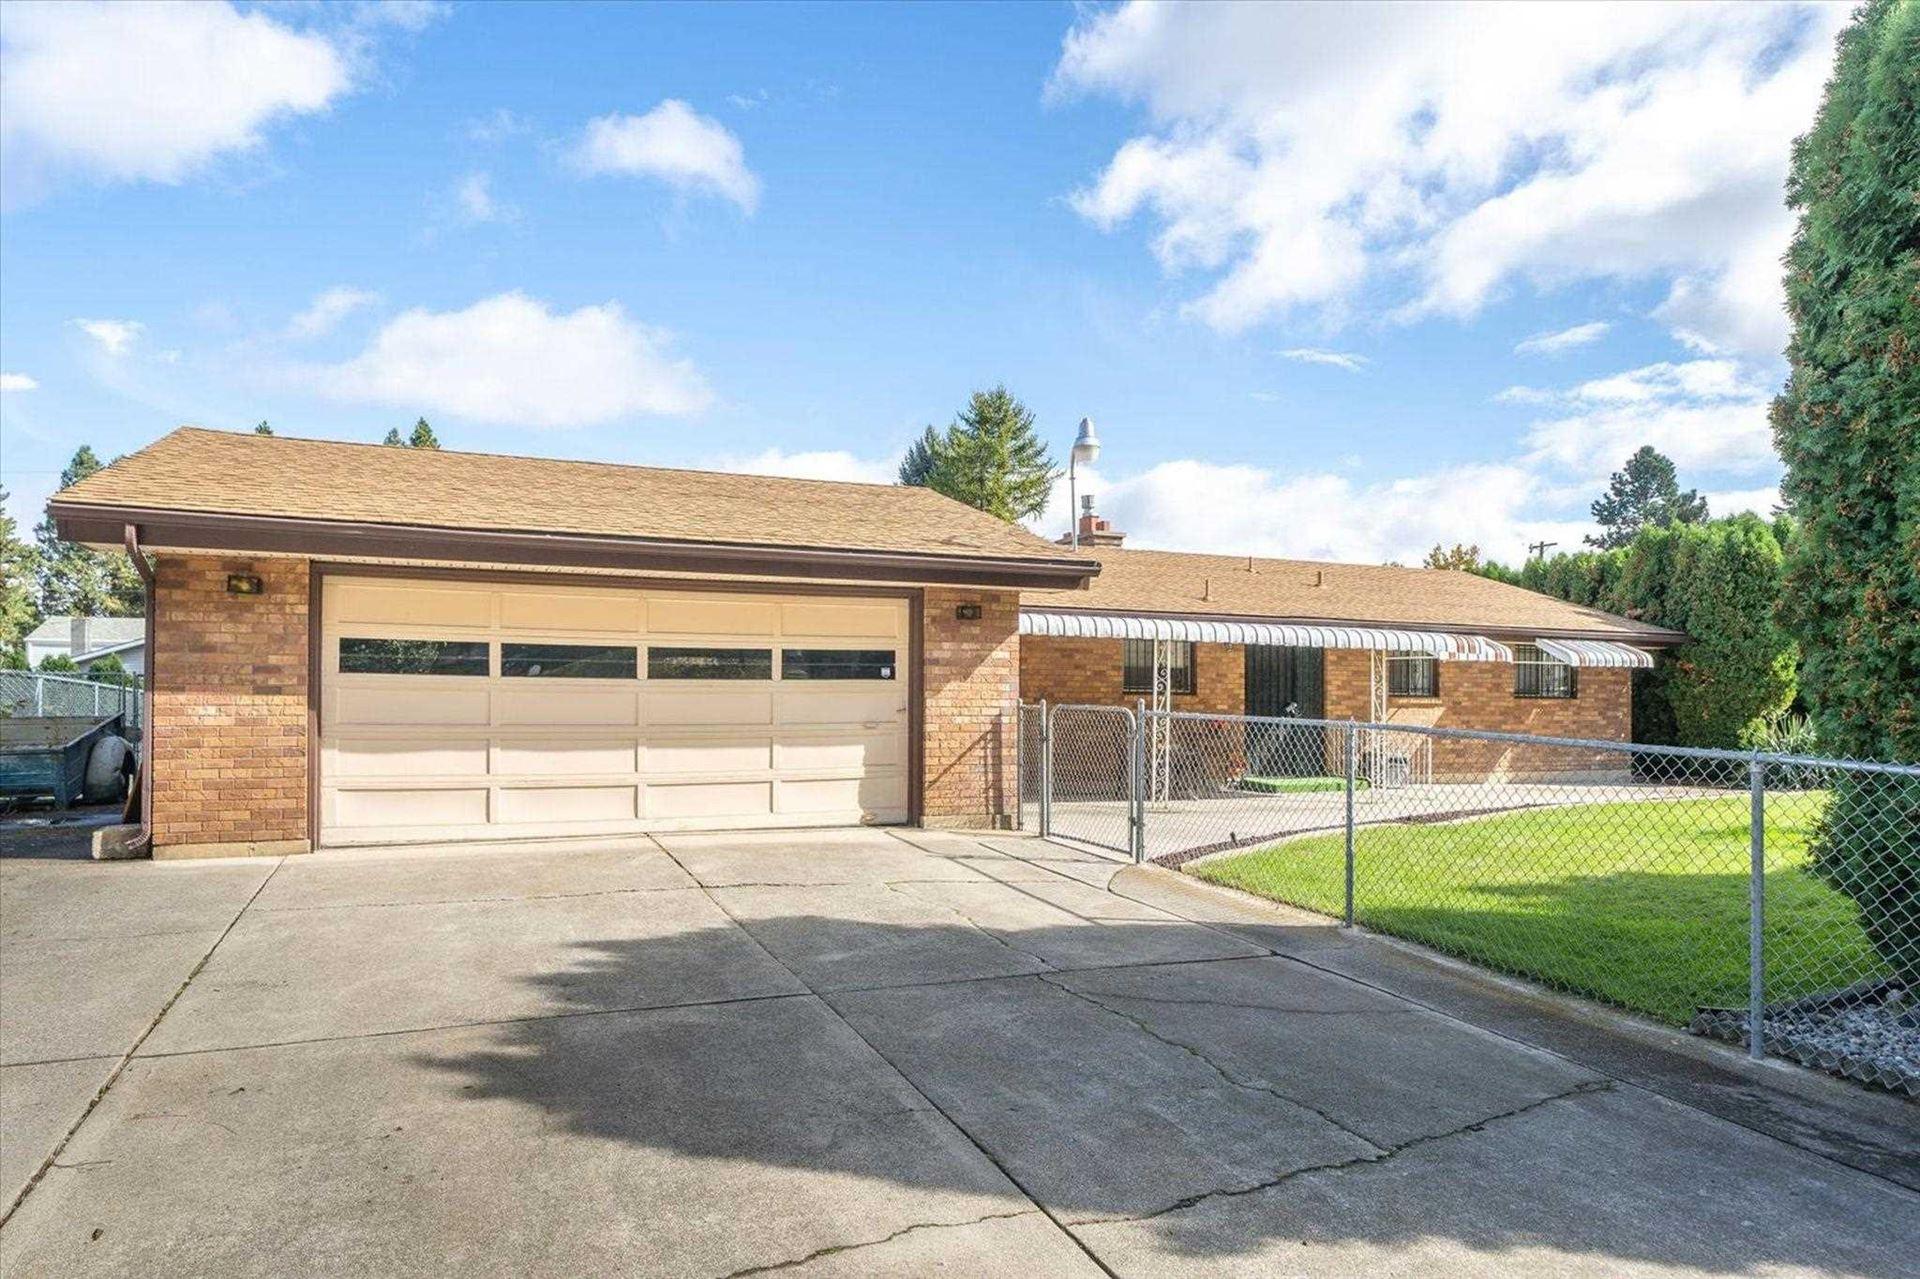 3805 S Sundown Dr, Spokane Valley, WA 99206-9509 - #: 202123780